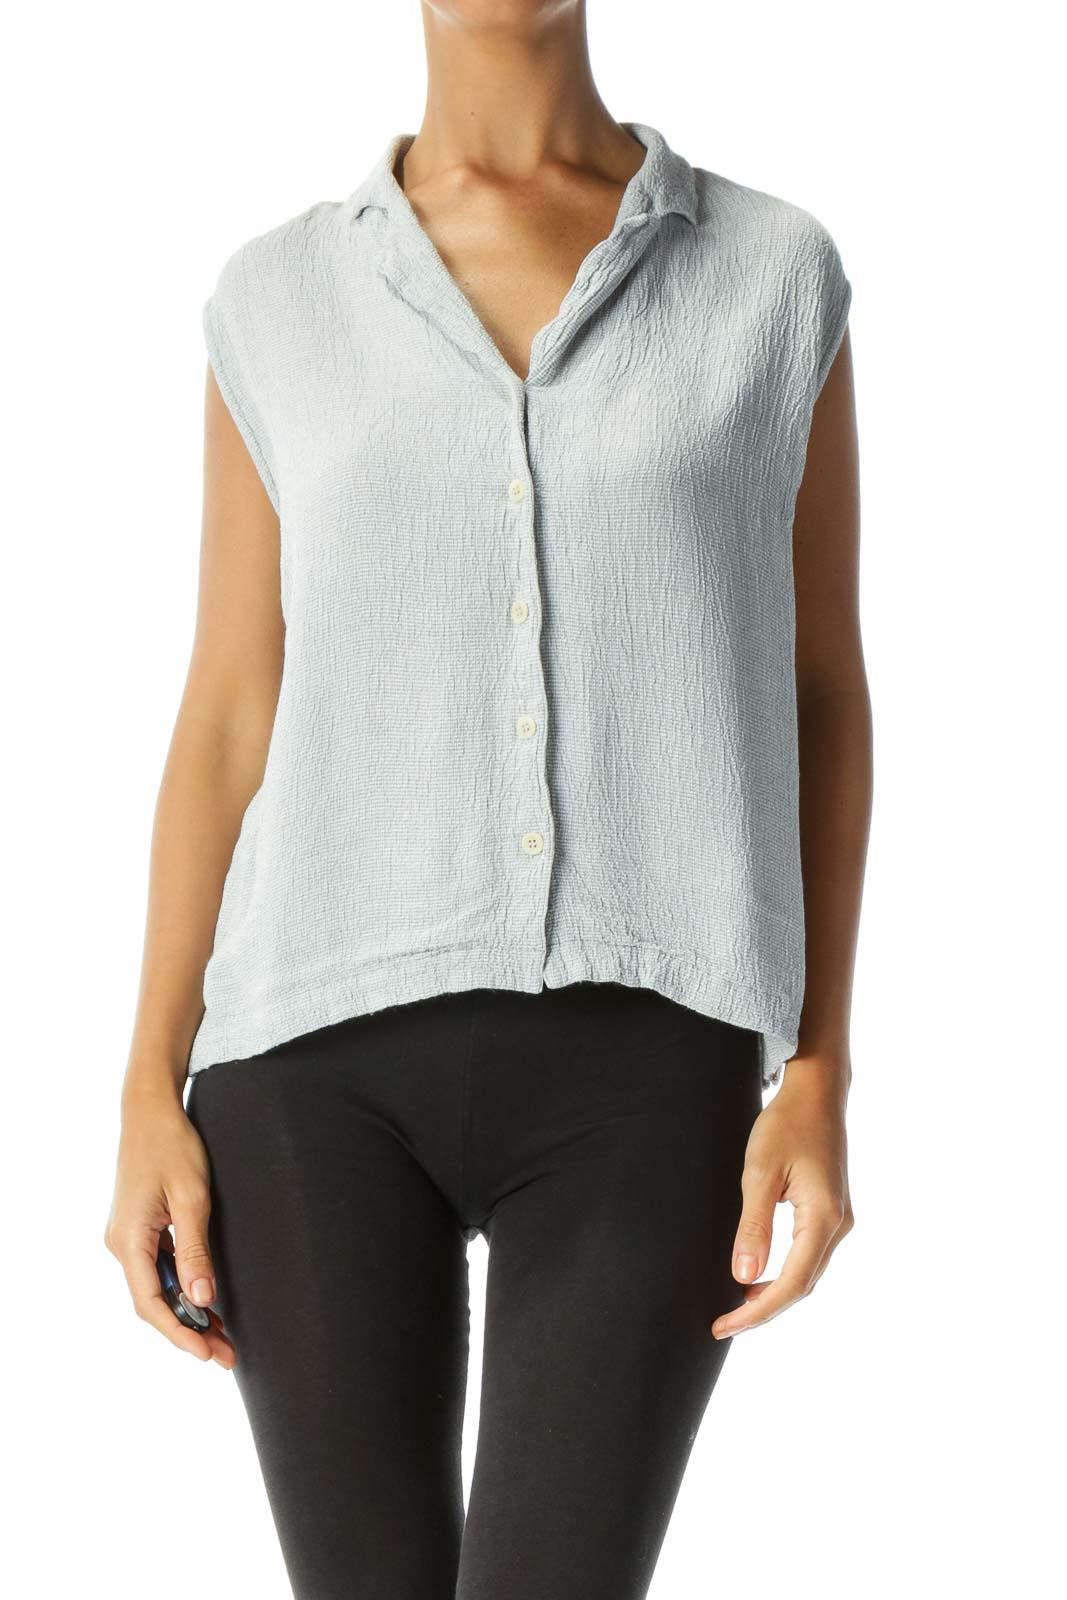 Green & White Sleeveless Textured Button-Up Blouse